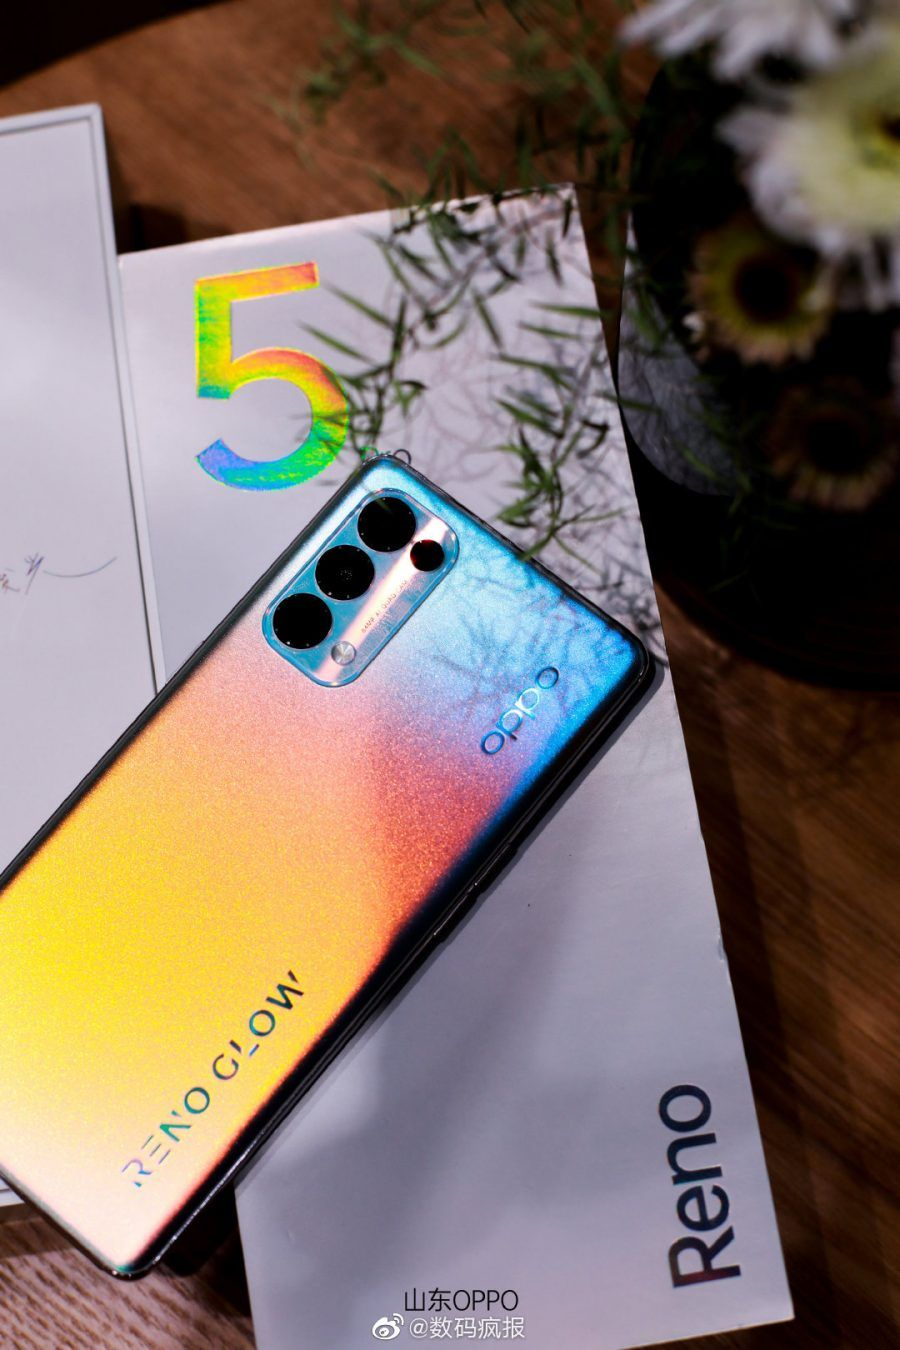 Reno5Pro 1 Android 11, china, gama-média, imagens reais, oppo, OPPO Reno 5, Reno 5 Pro, smartphone, topo de gama